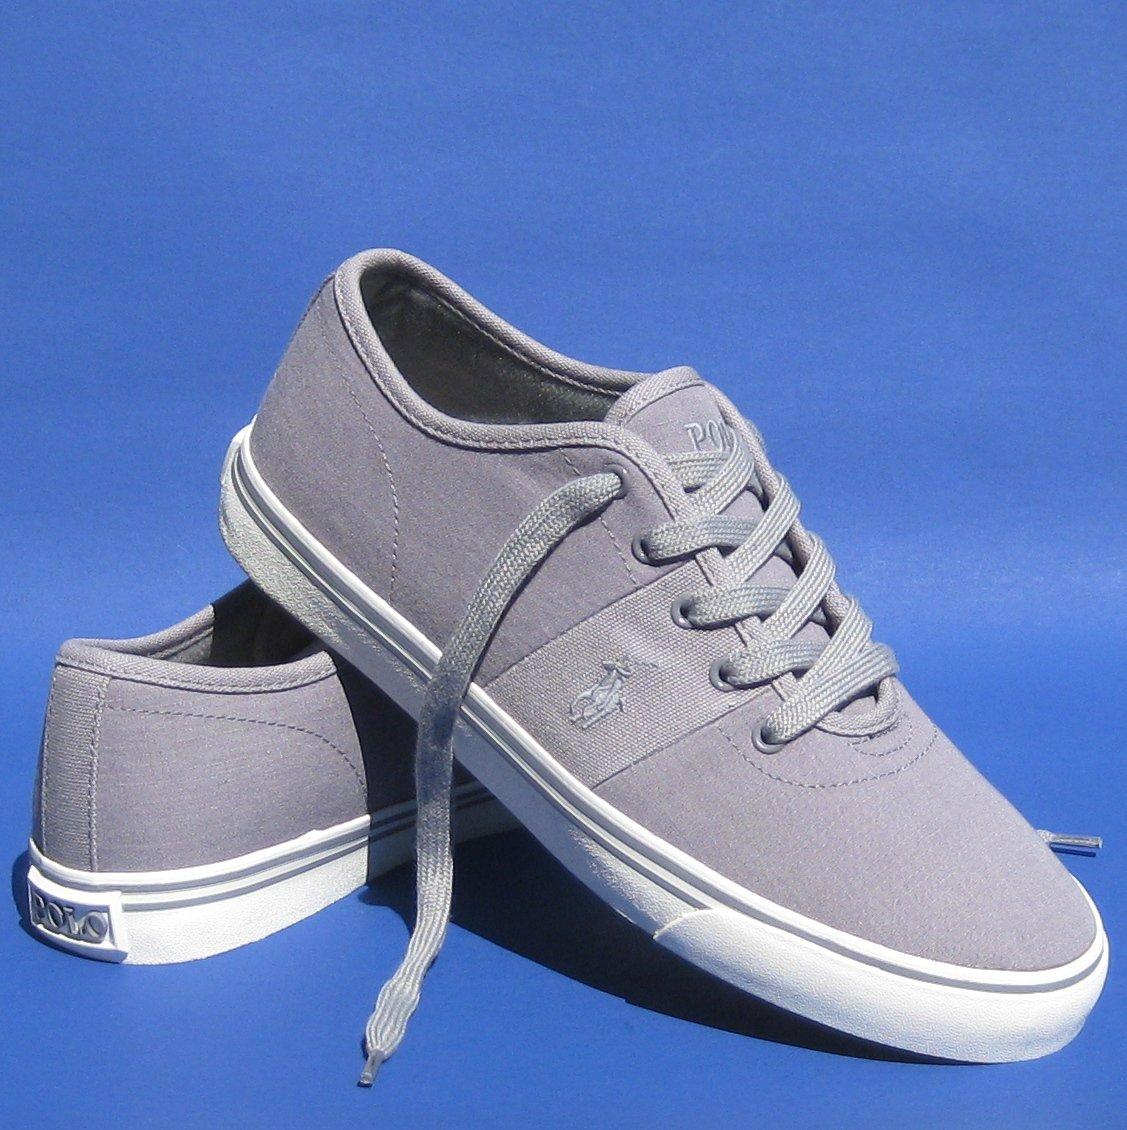 NIB Polo Ralph Lauren Men's Zadok Gray Athletic Sneakers Shoes - 11.5D